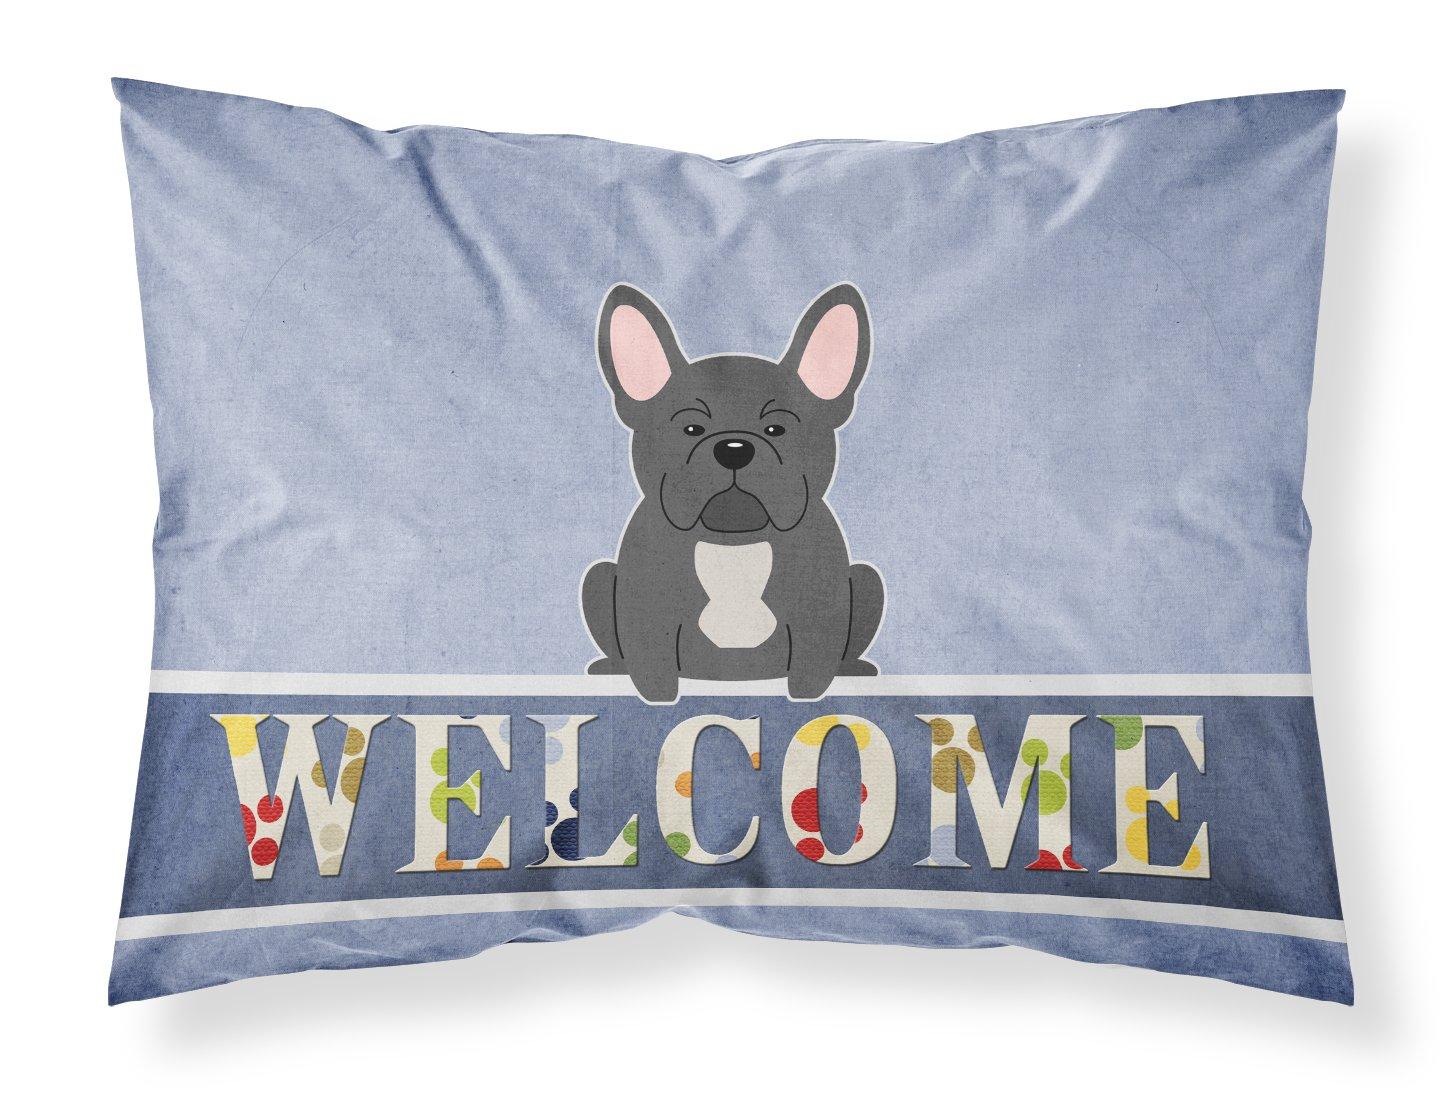 Carolines Treasures Moscow Watchdog Welcome Pillowcase Standard,